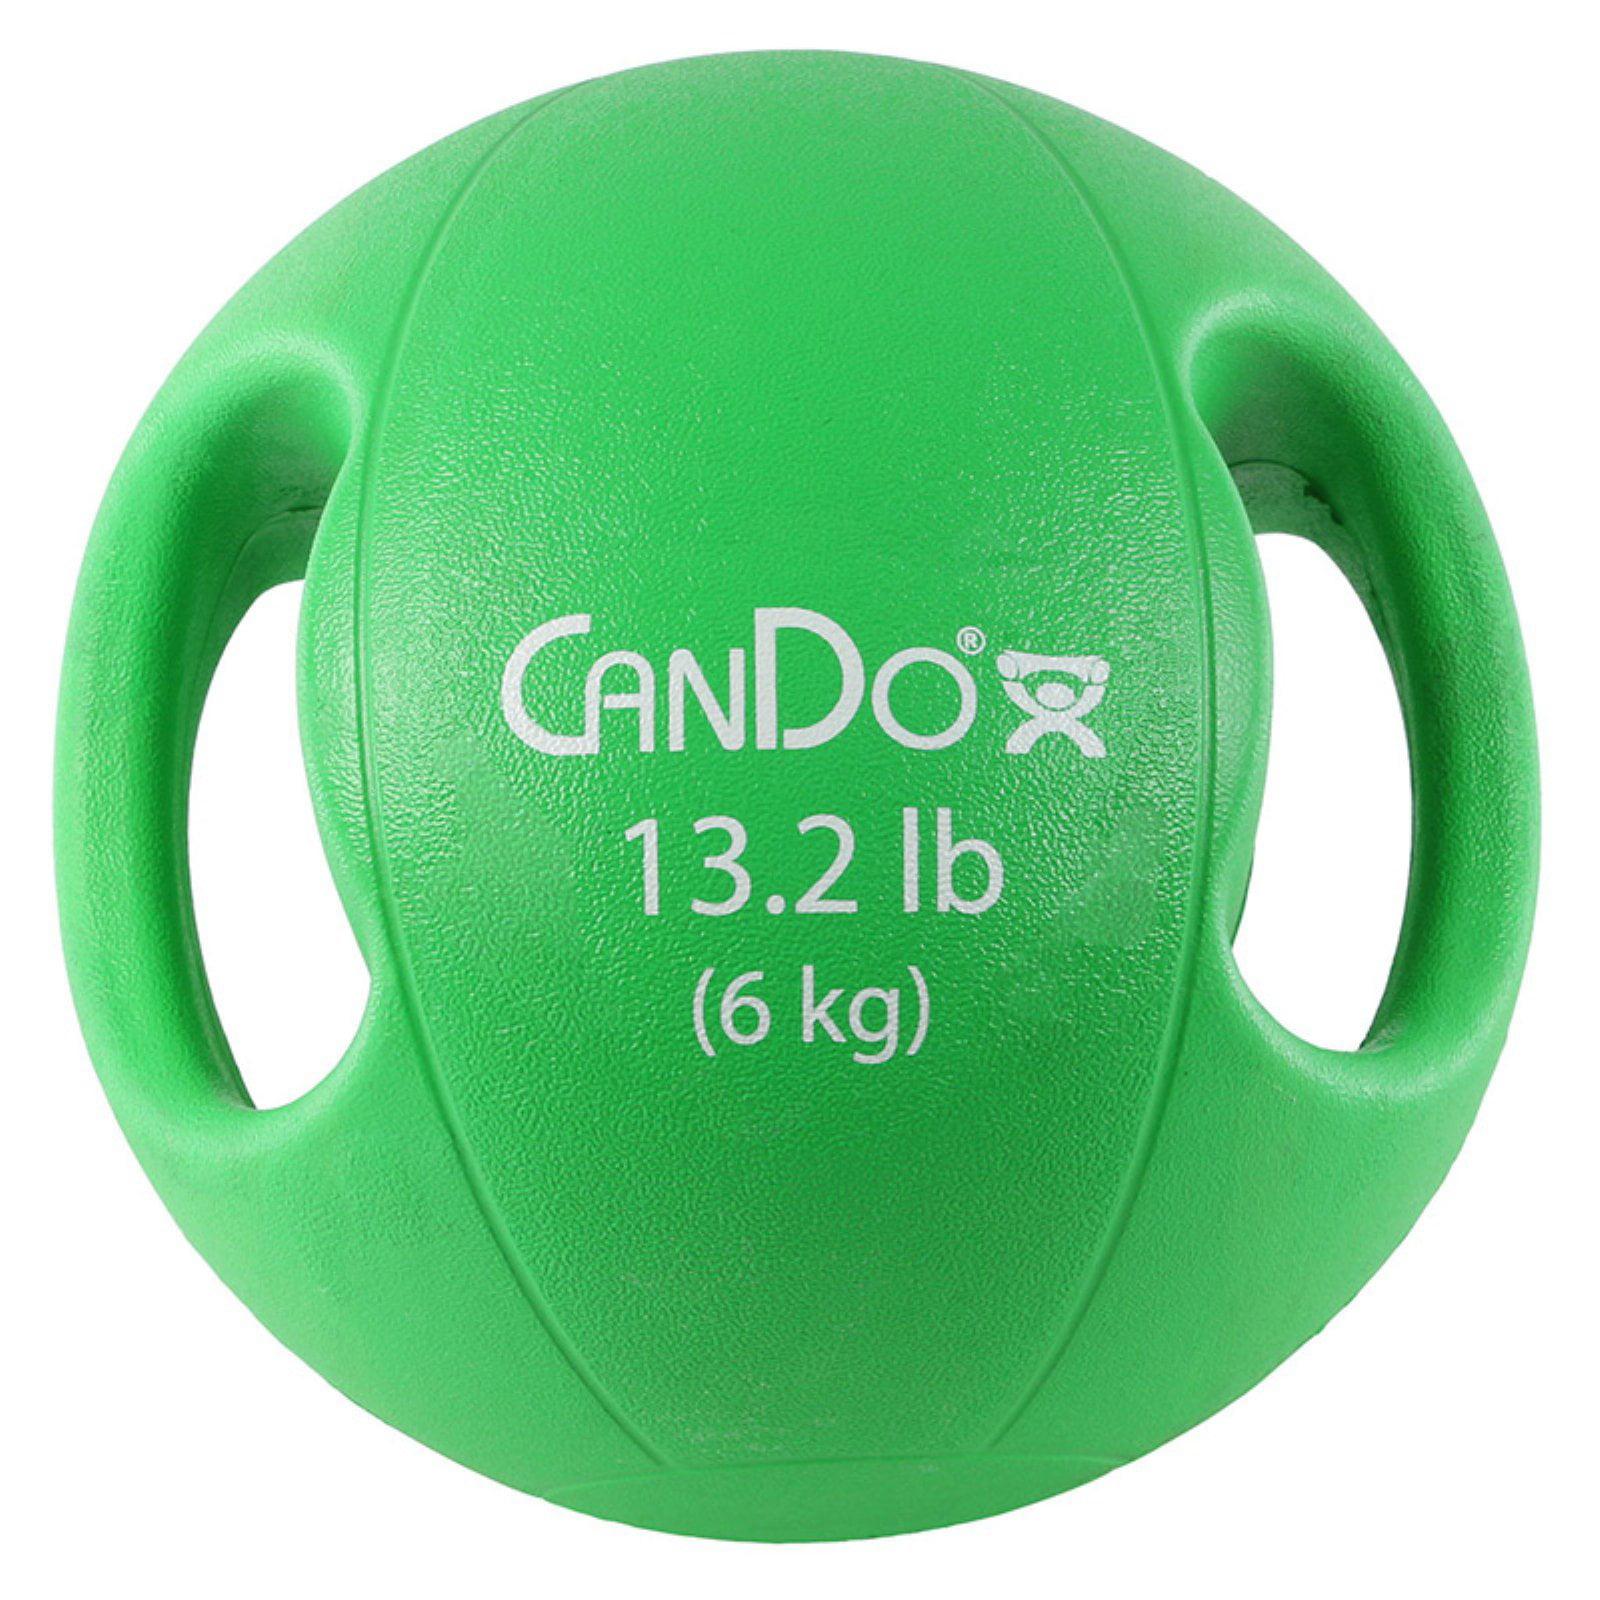 CanDo Molded Dual Handle Medicine Ball